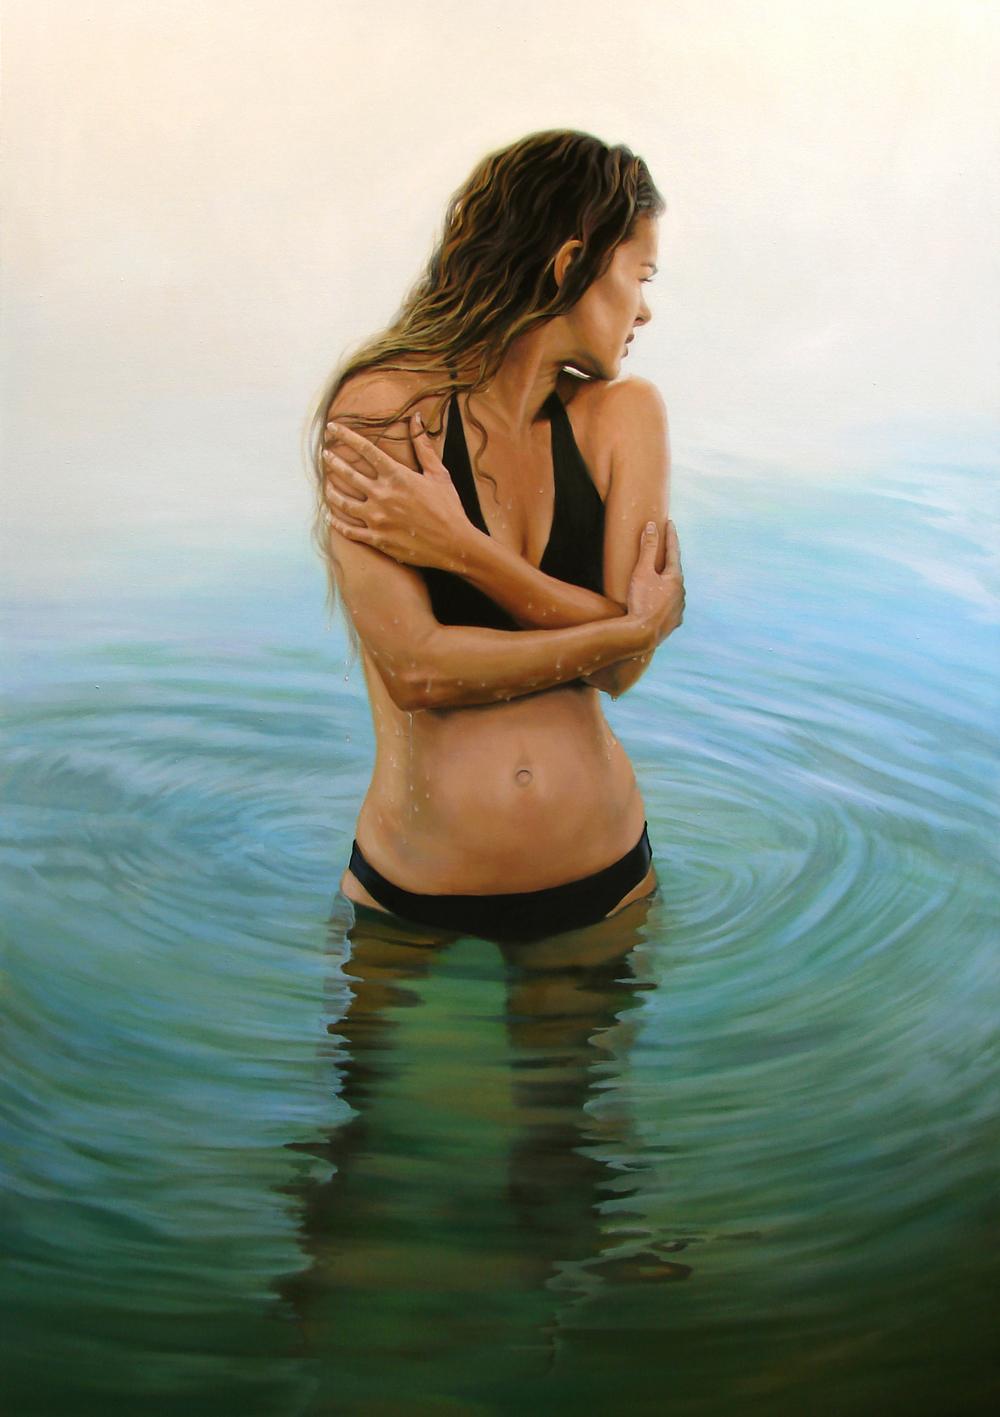 Arturo Samaniego - Naples, FL artist